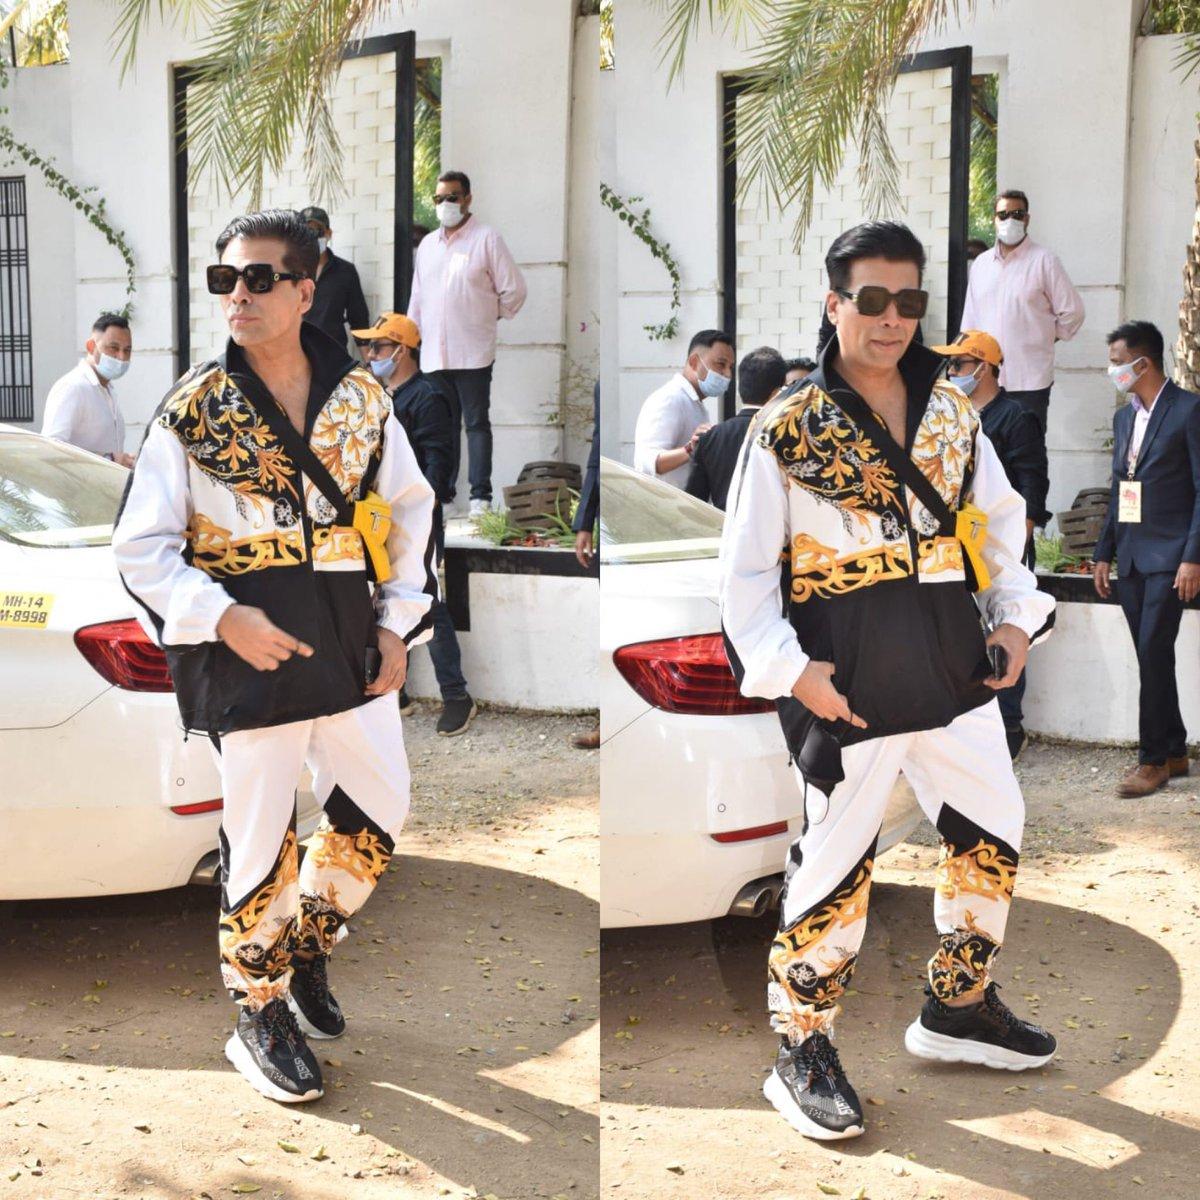 Karan Johar #snapped at @varundvn 's wedding venue at Alibaugh 😍😍😍 #bollywood #bollywoodactor #bollywoodceleb #bollywoodnews #karanjohar #varundhawan #handsome #wedding #celebration